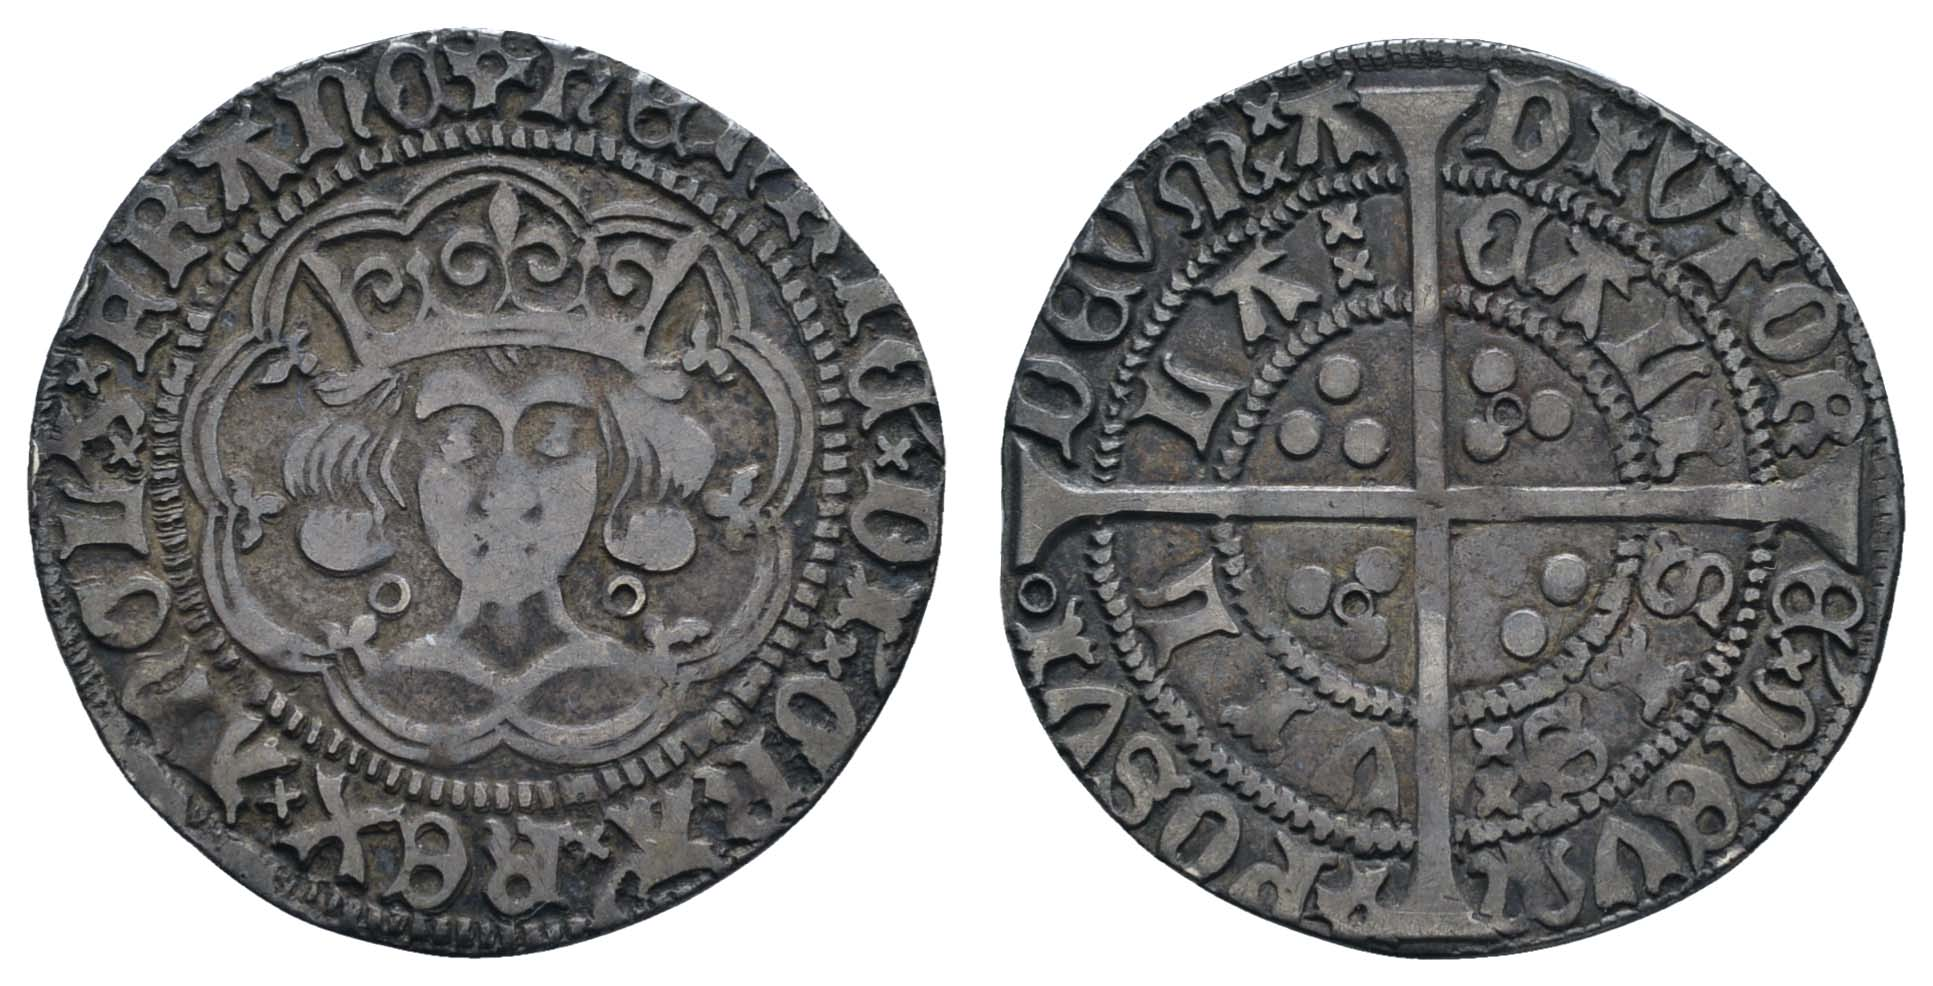 Lot 1314 - europa bis 1799 - Großbritannien -  Auktionshaus Ulrich Felzmann GmbH & Co. KG Coins single lots